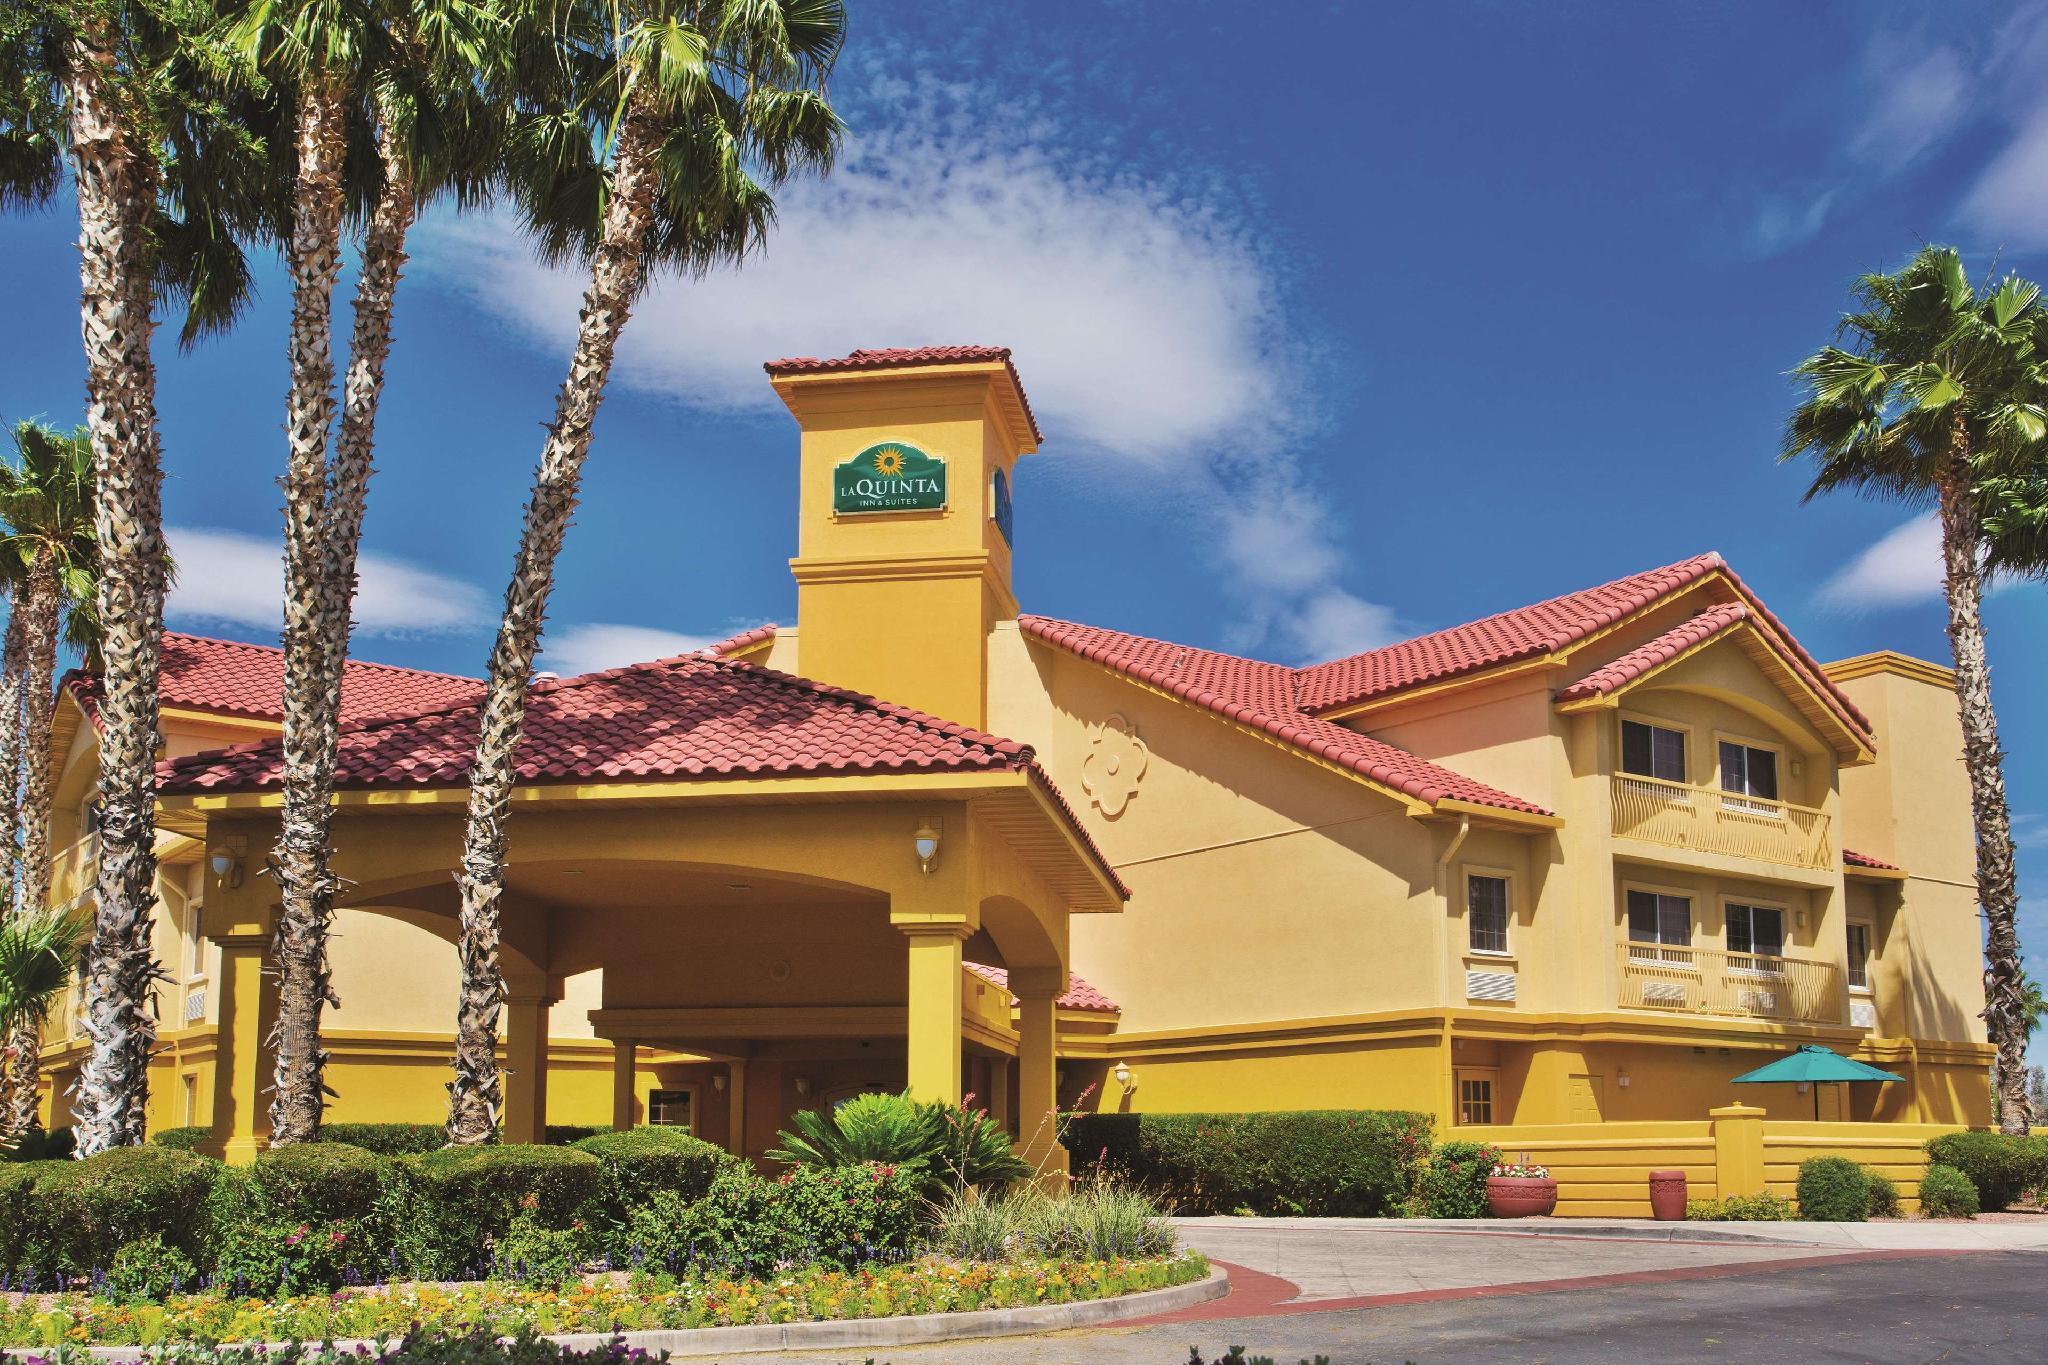 La Quinta Inn And Suites By Wyndham Tucson Airport